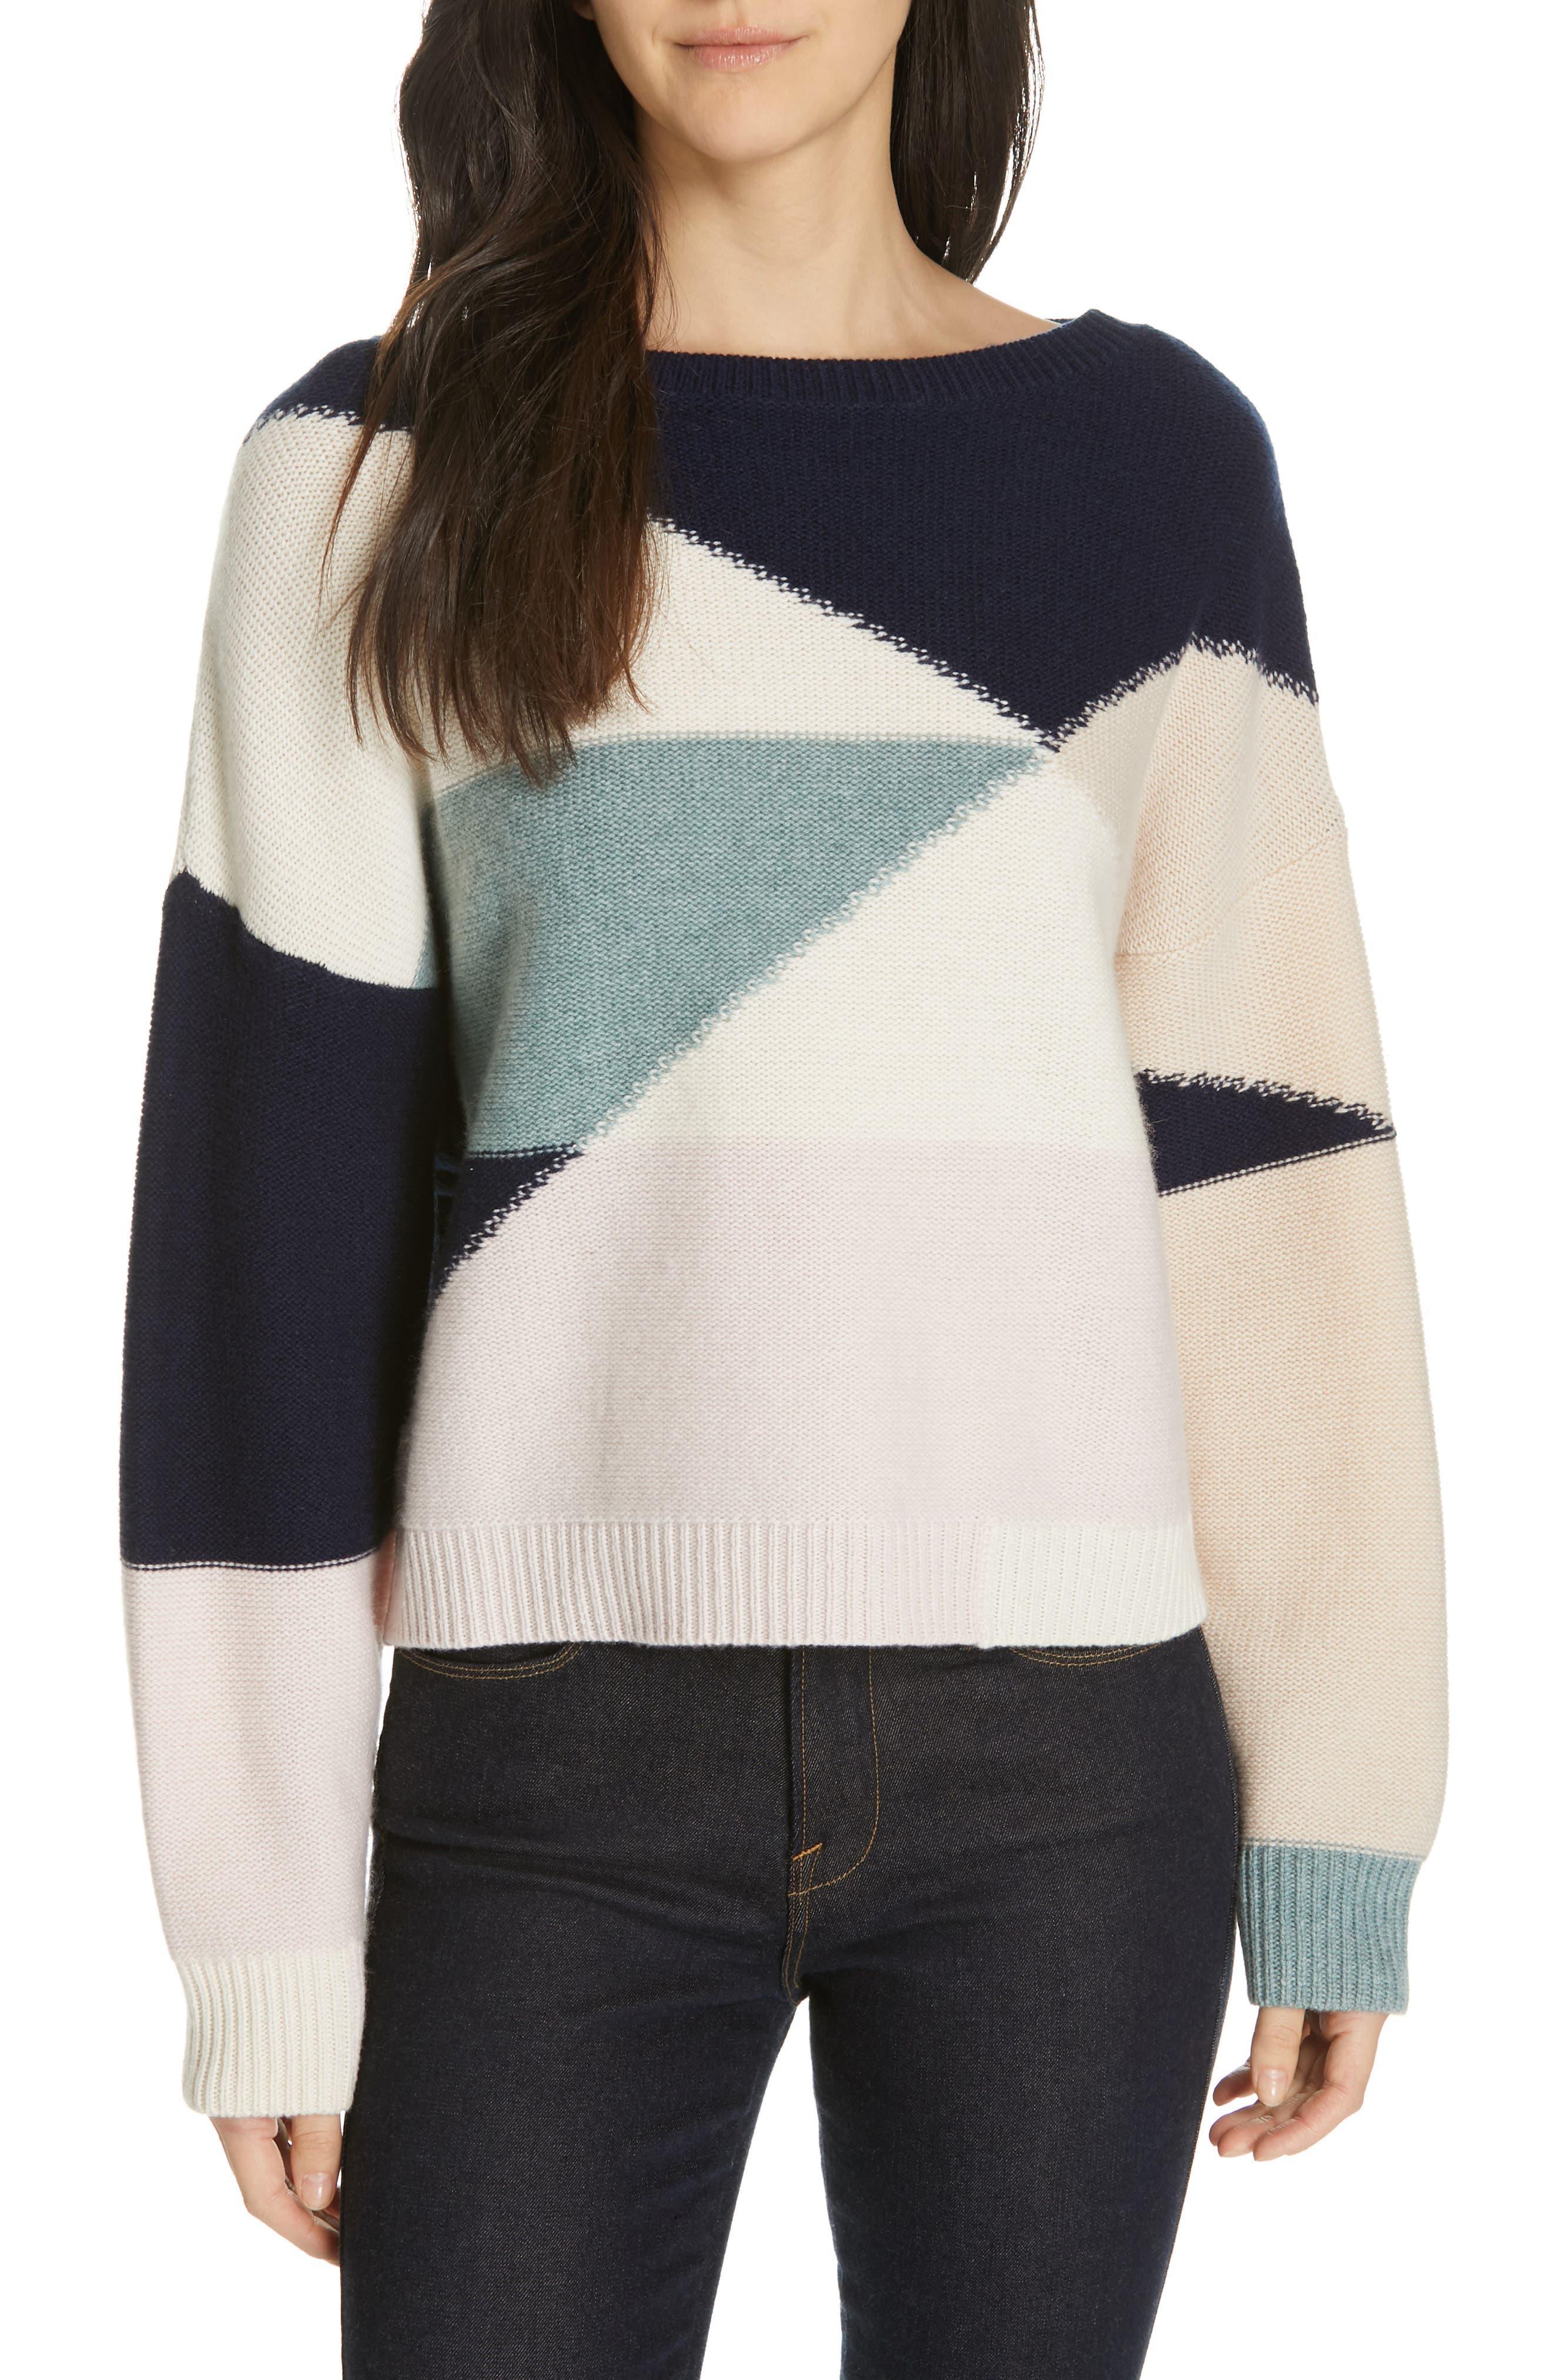 Joie Megu Wool & Cashmere Sweater, White